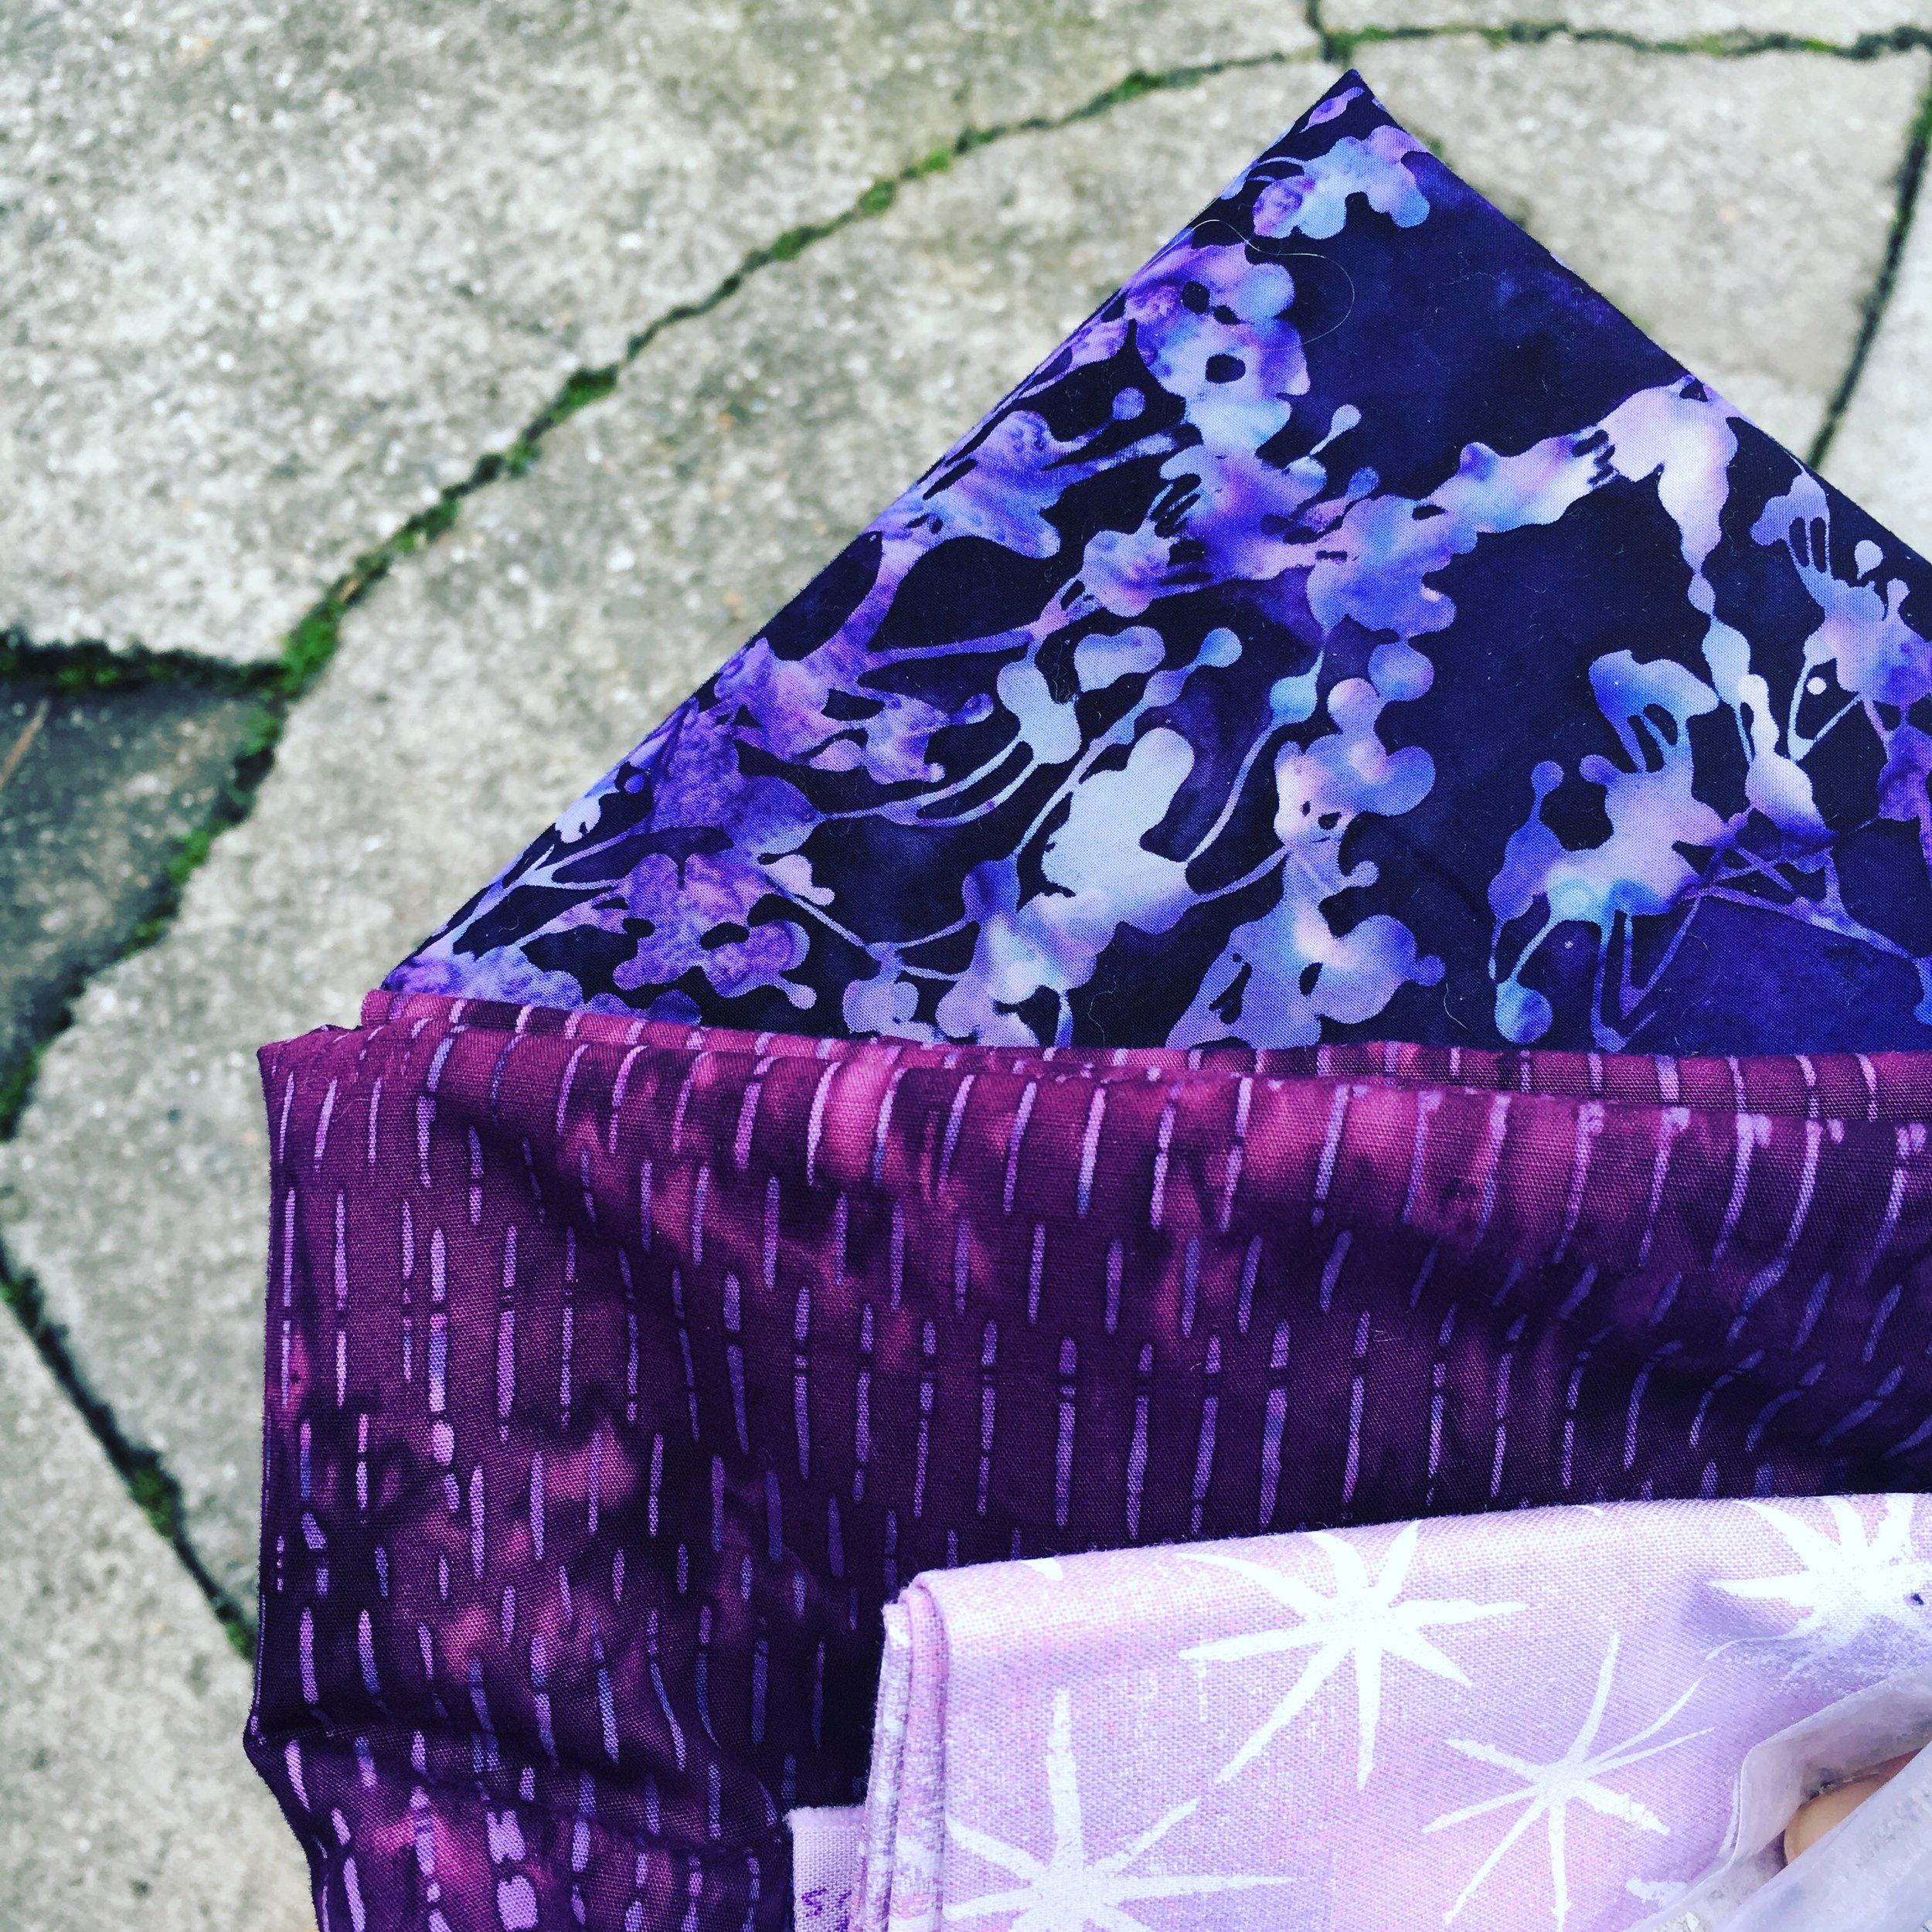 Batik for Lent